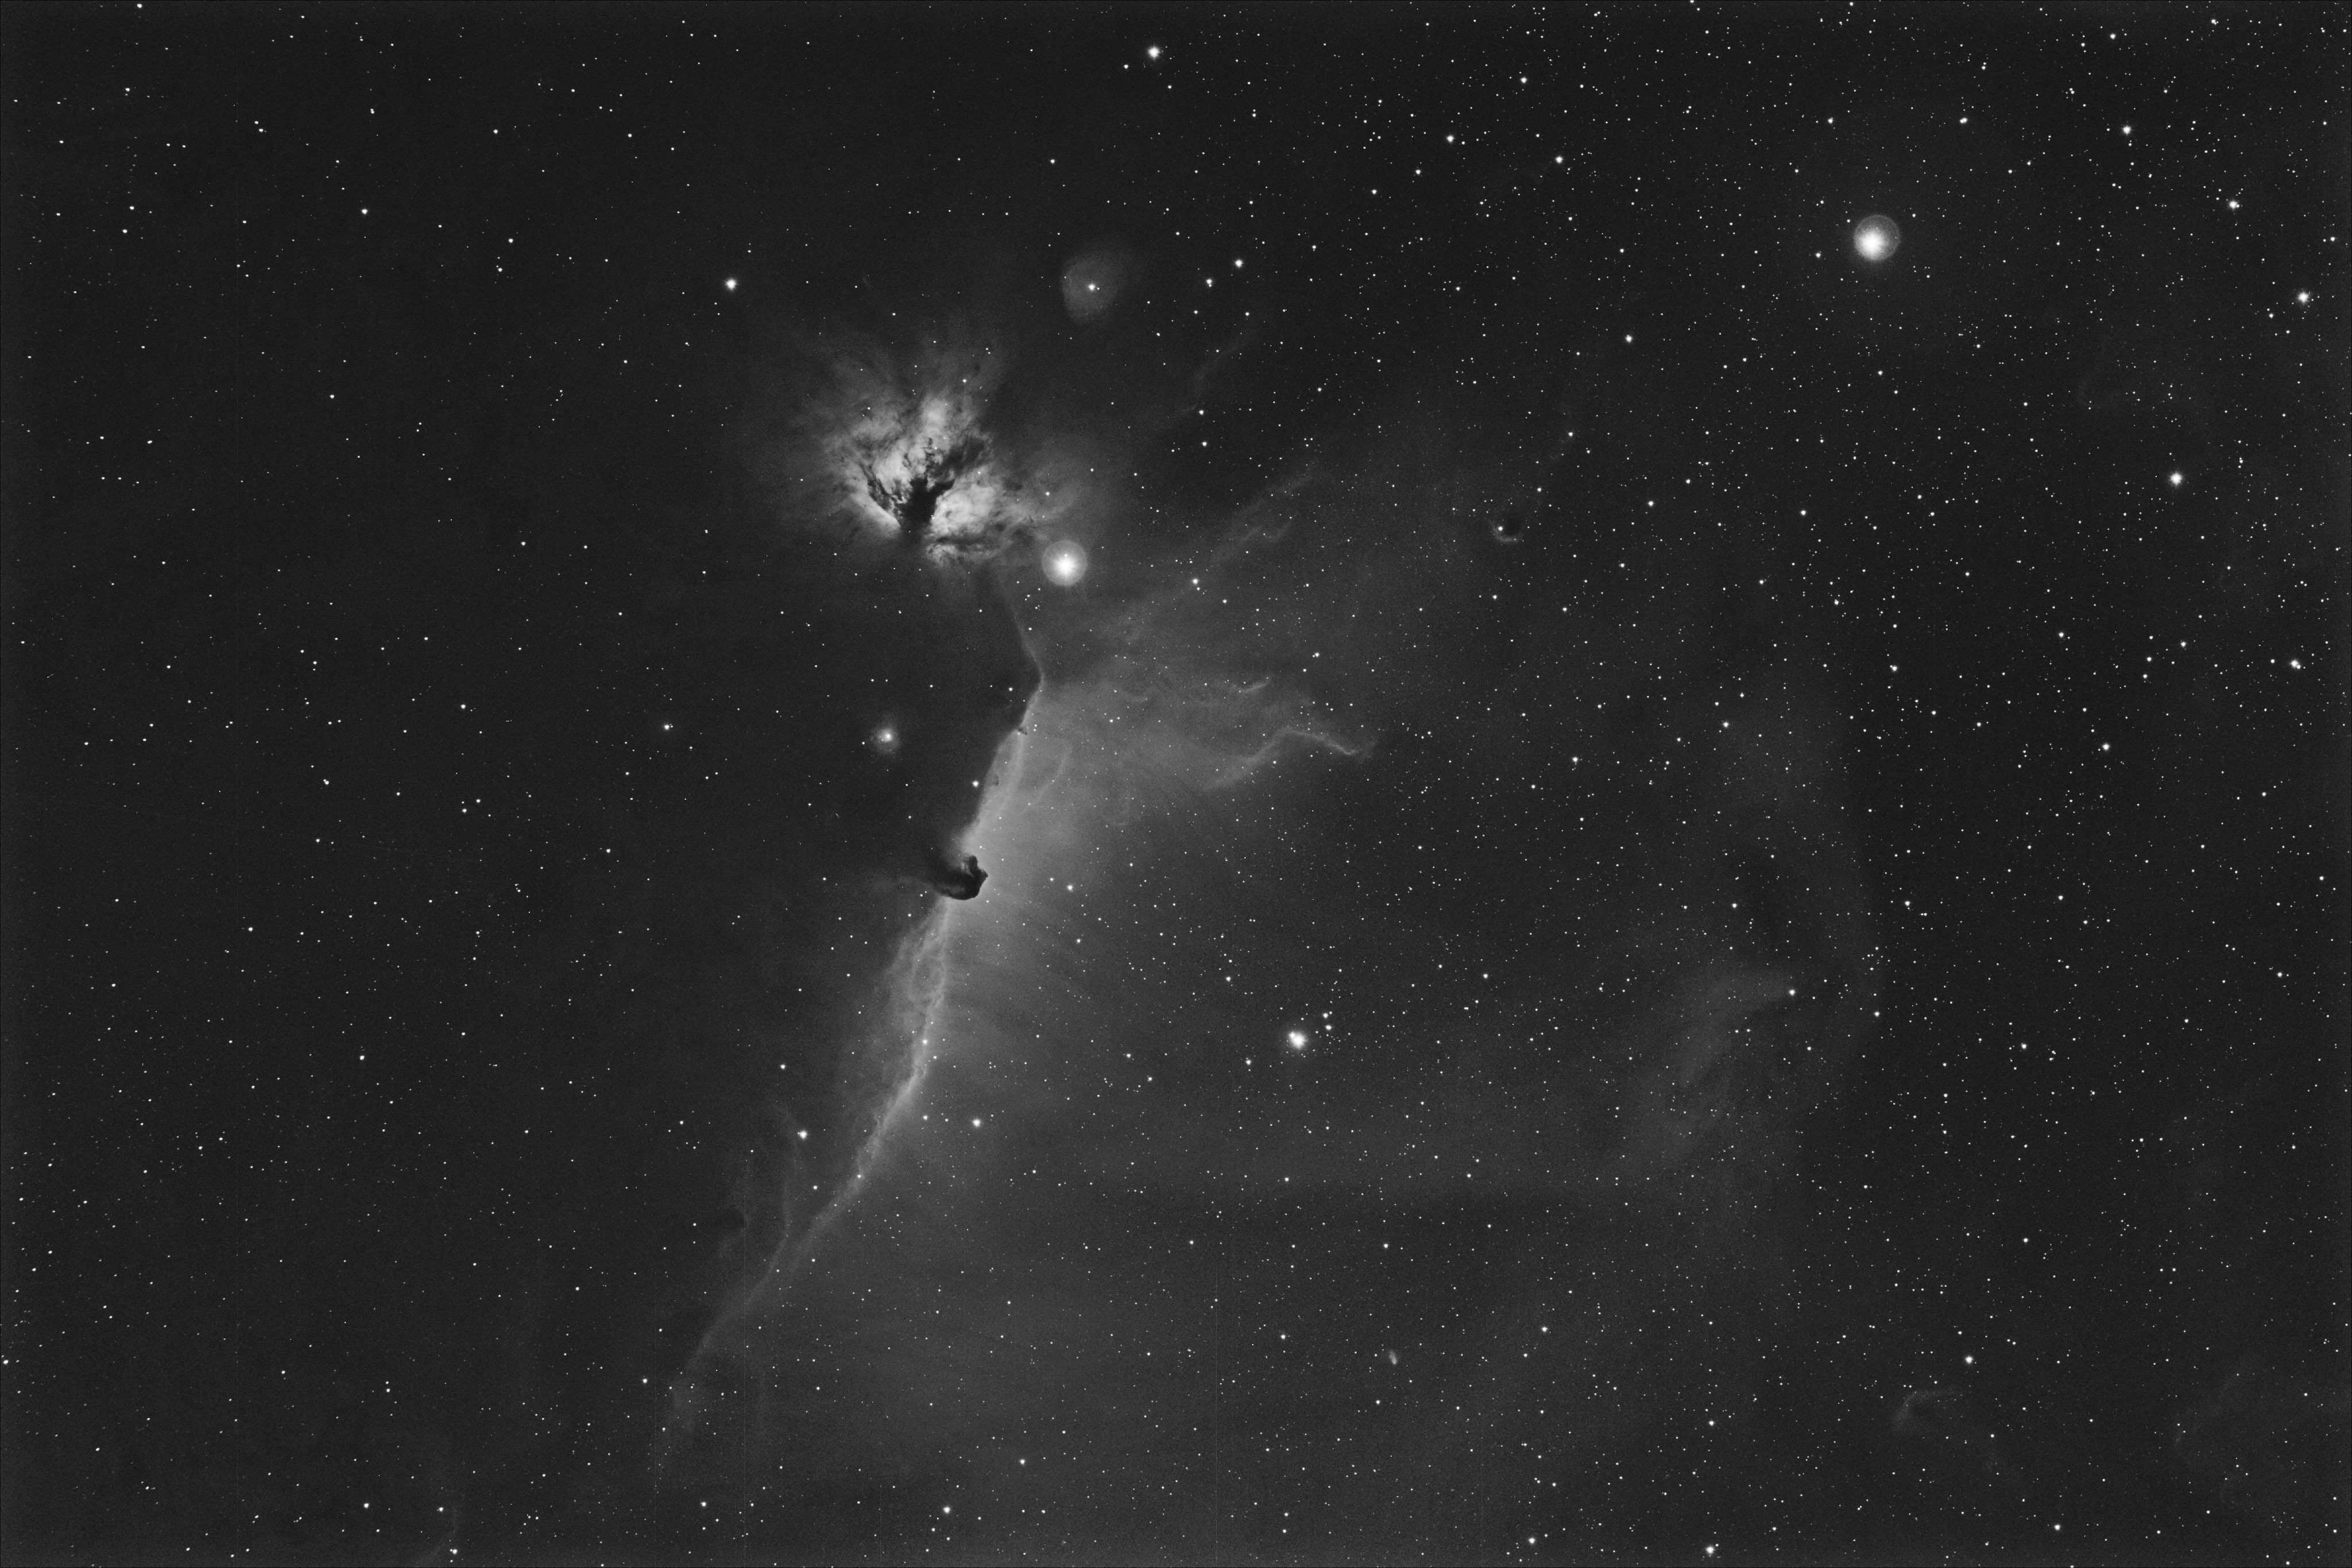 IC 434 - B 33 - NGC 2024